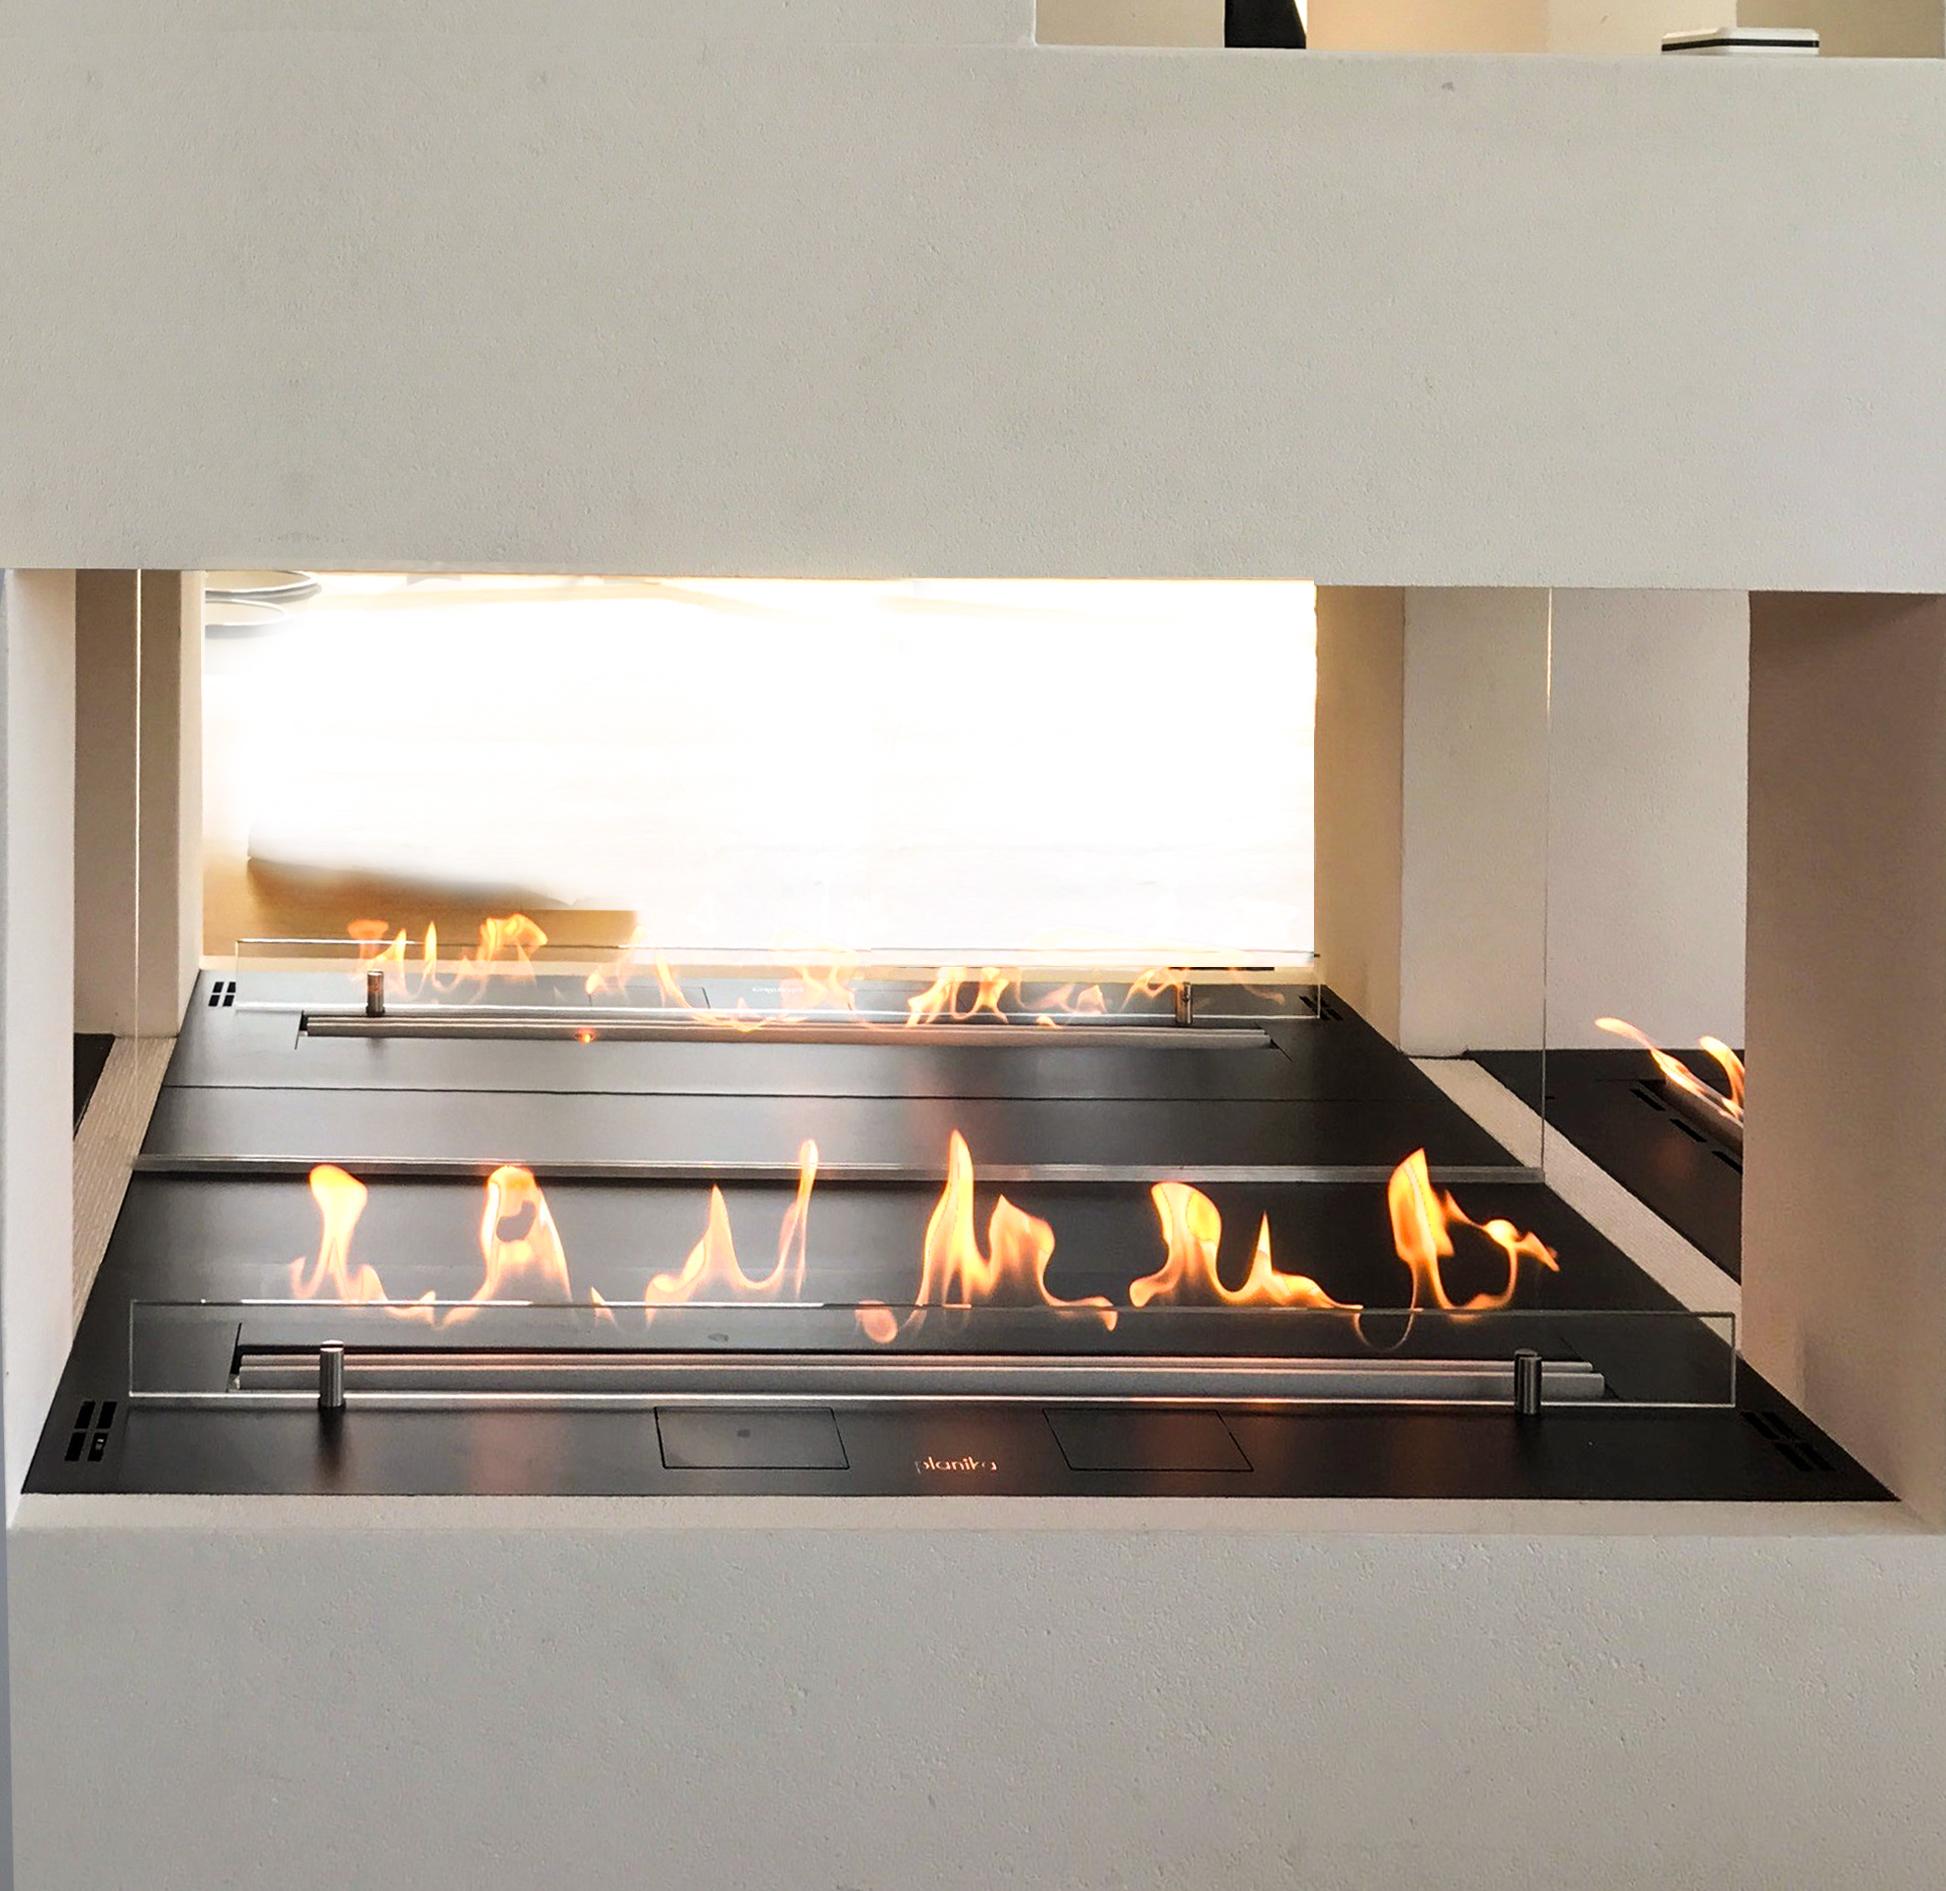 Fire-Line-Automatic-3-Planika-New-York-USA-Architect-APD-Design-Gabriella-Albini-and-McKee-Patterson-Distributor-Fairview-Hearth.jpg